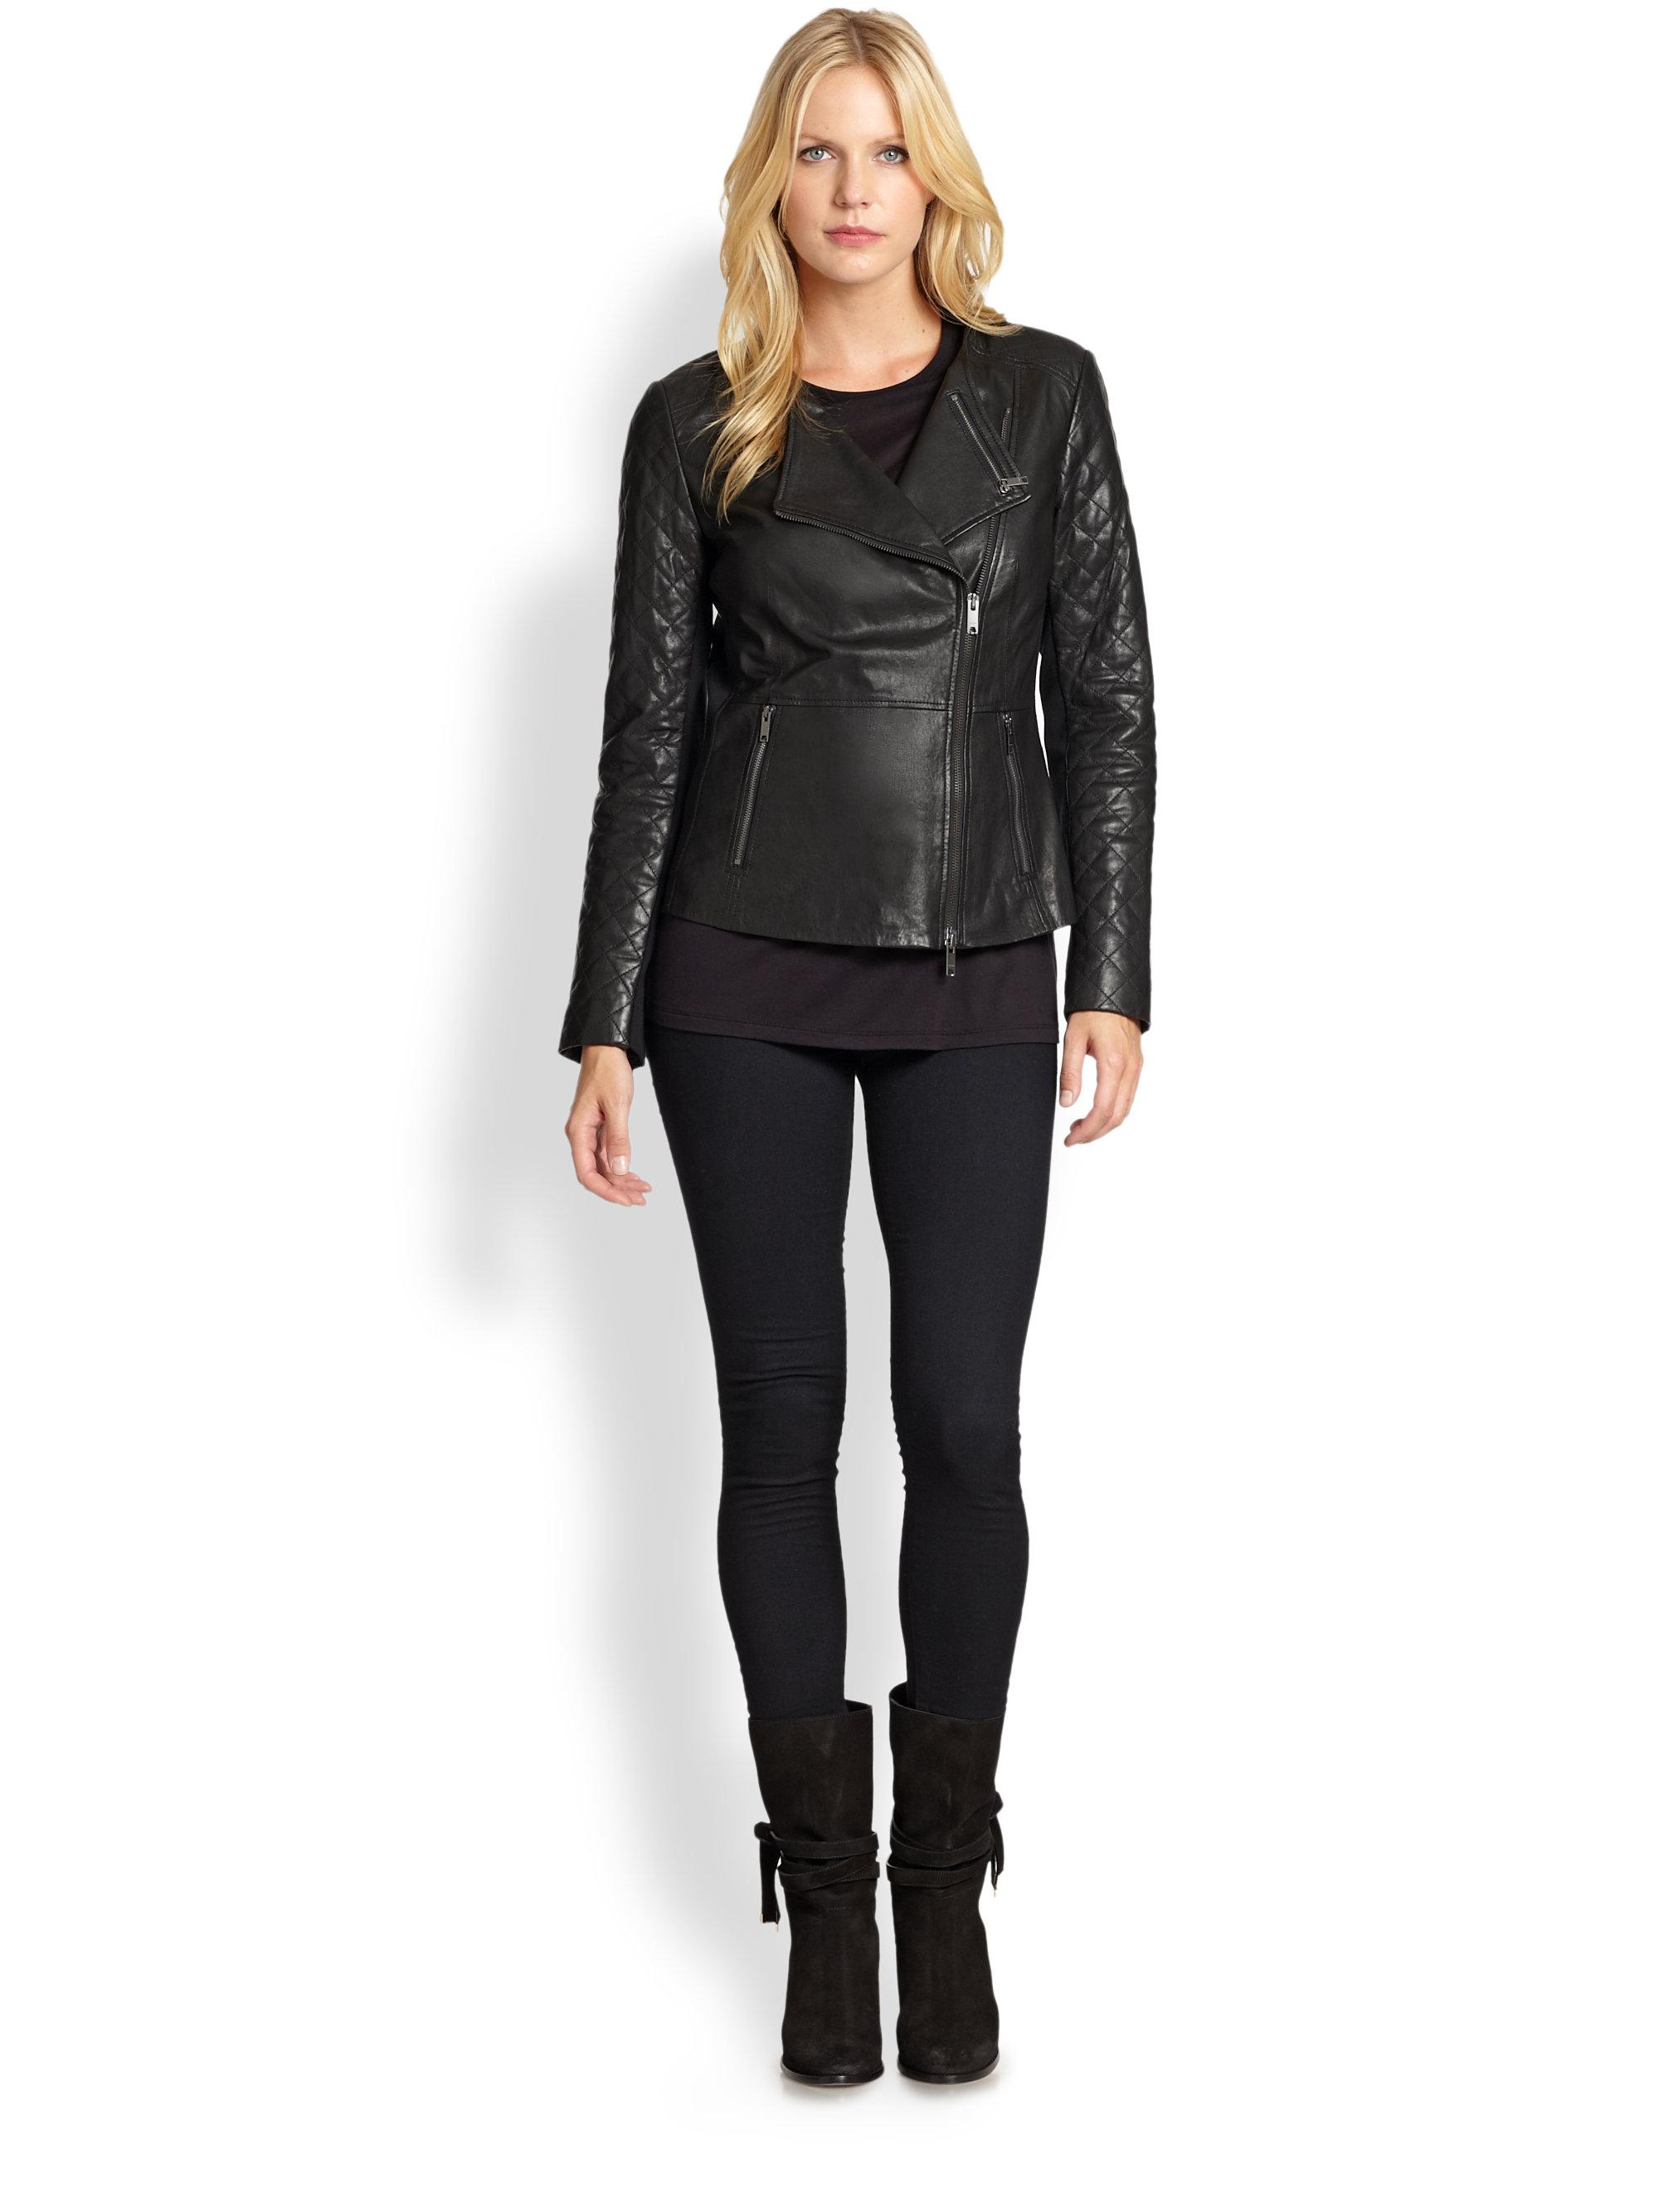 Dkny leather motorcycle jacket